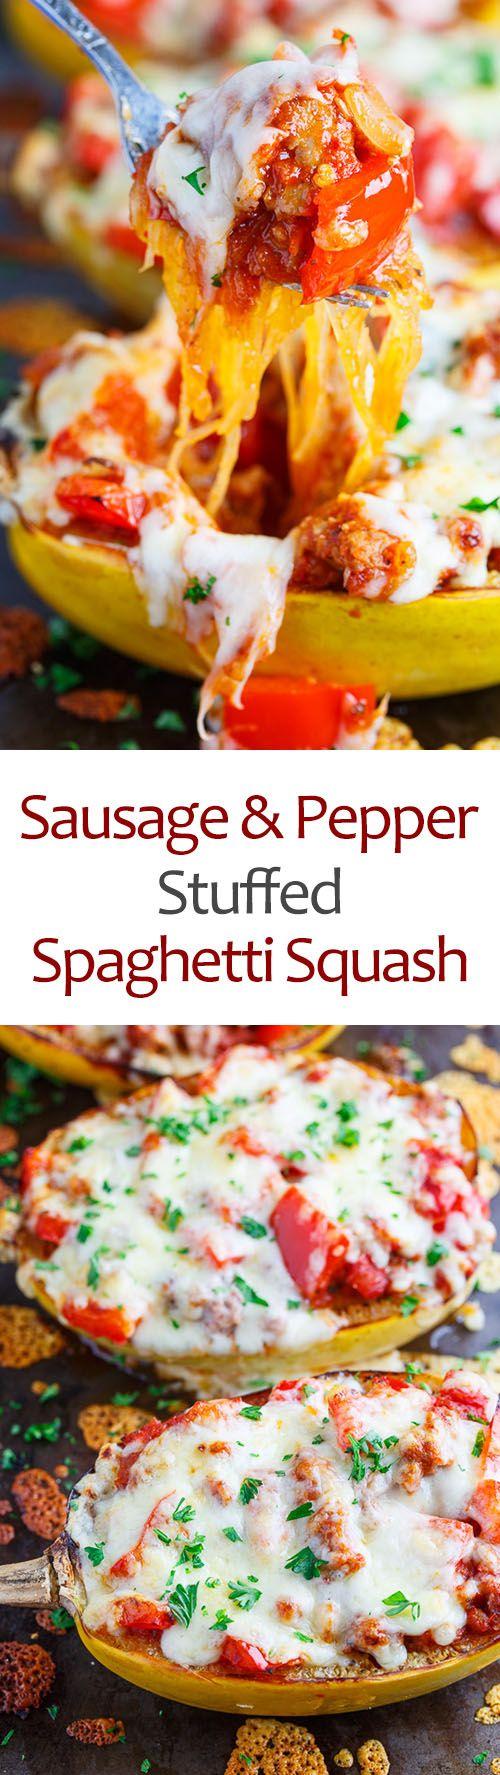 ideas about Stuffed Spaghetti Squash